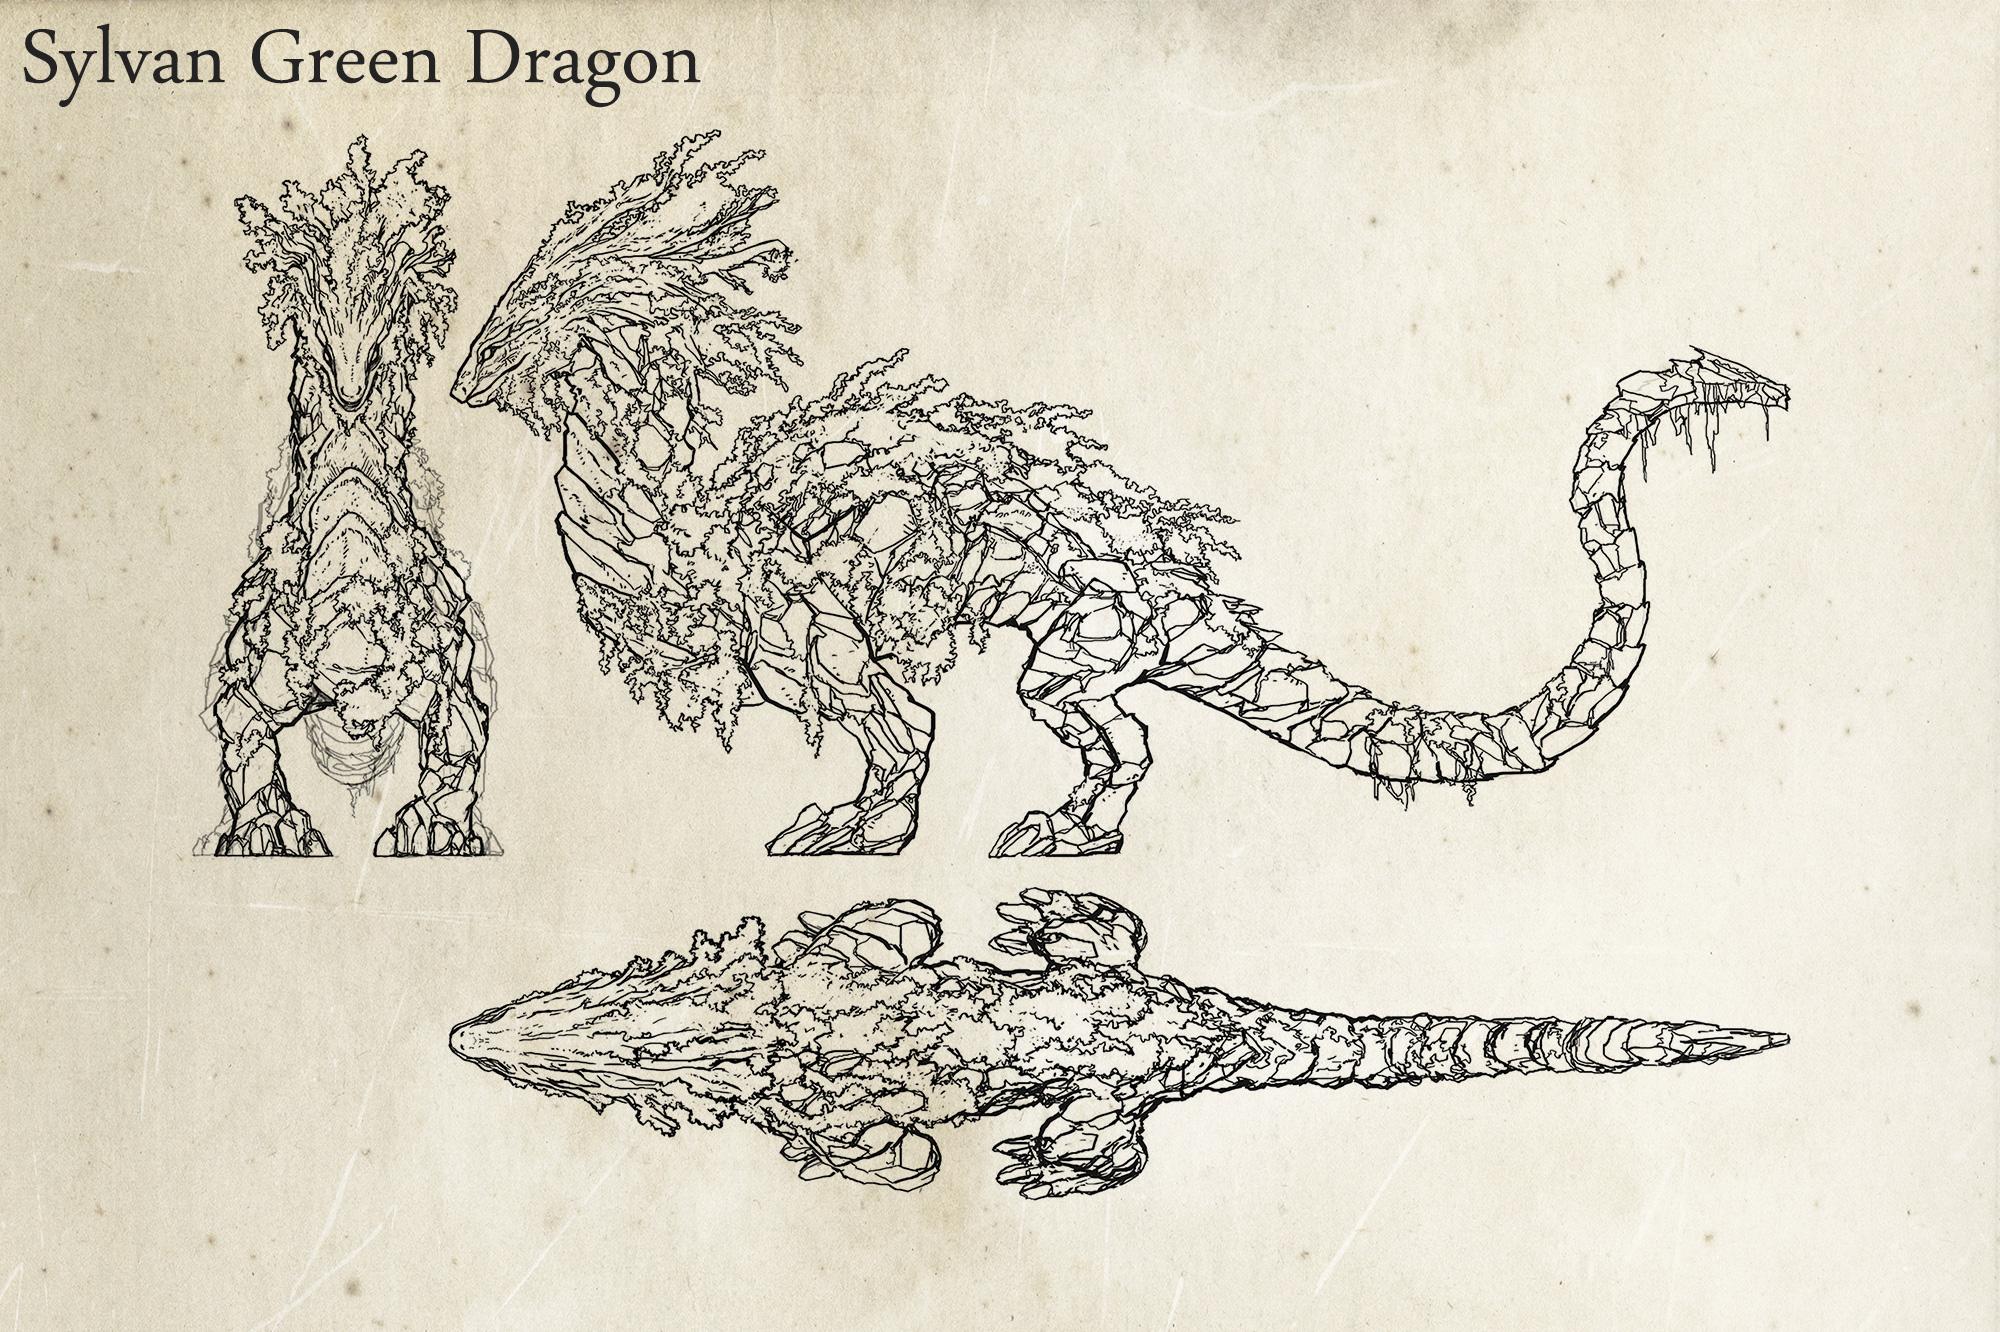 https://ubistatic-a.akamaihd.net/0004/prod/images/150626_Sylvan_3/MMH7_Green_Dragon_T.jpg